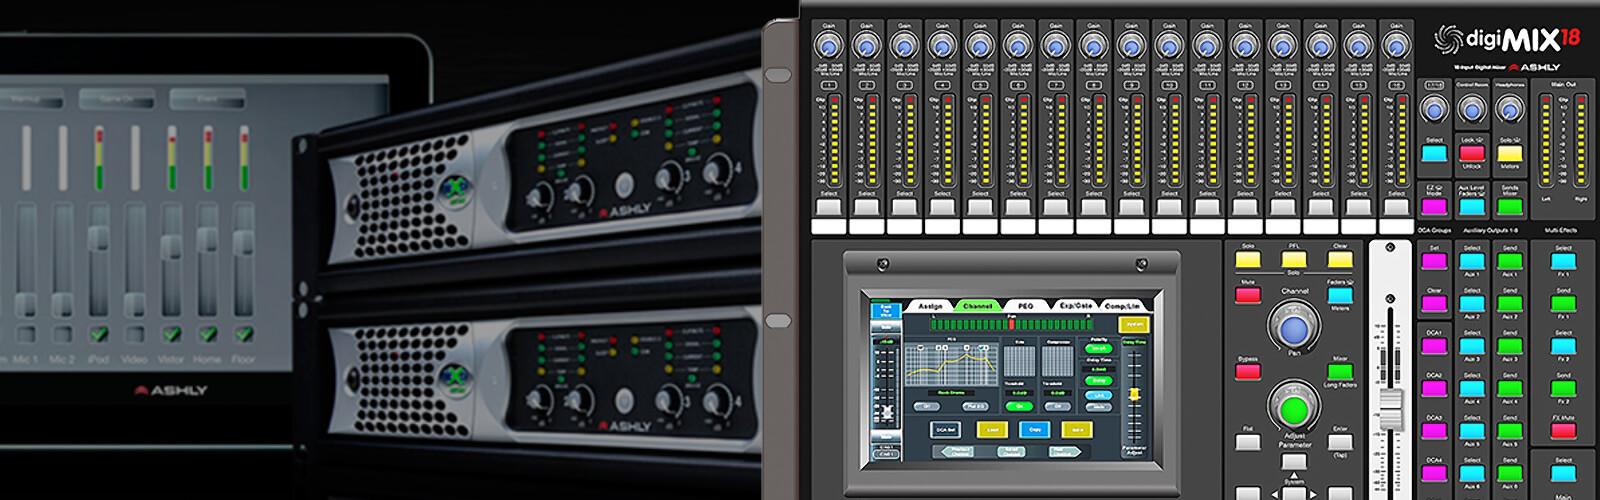 digital mixing software example